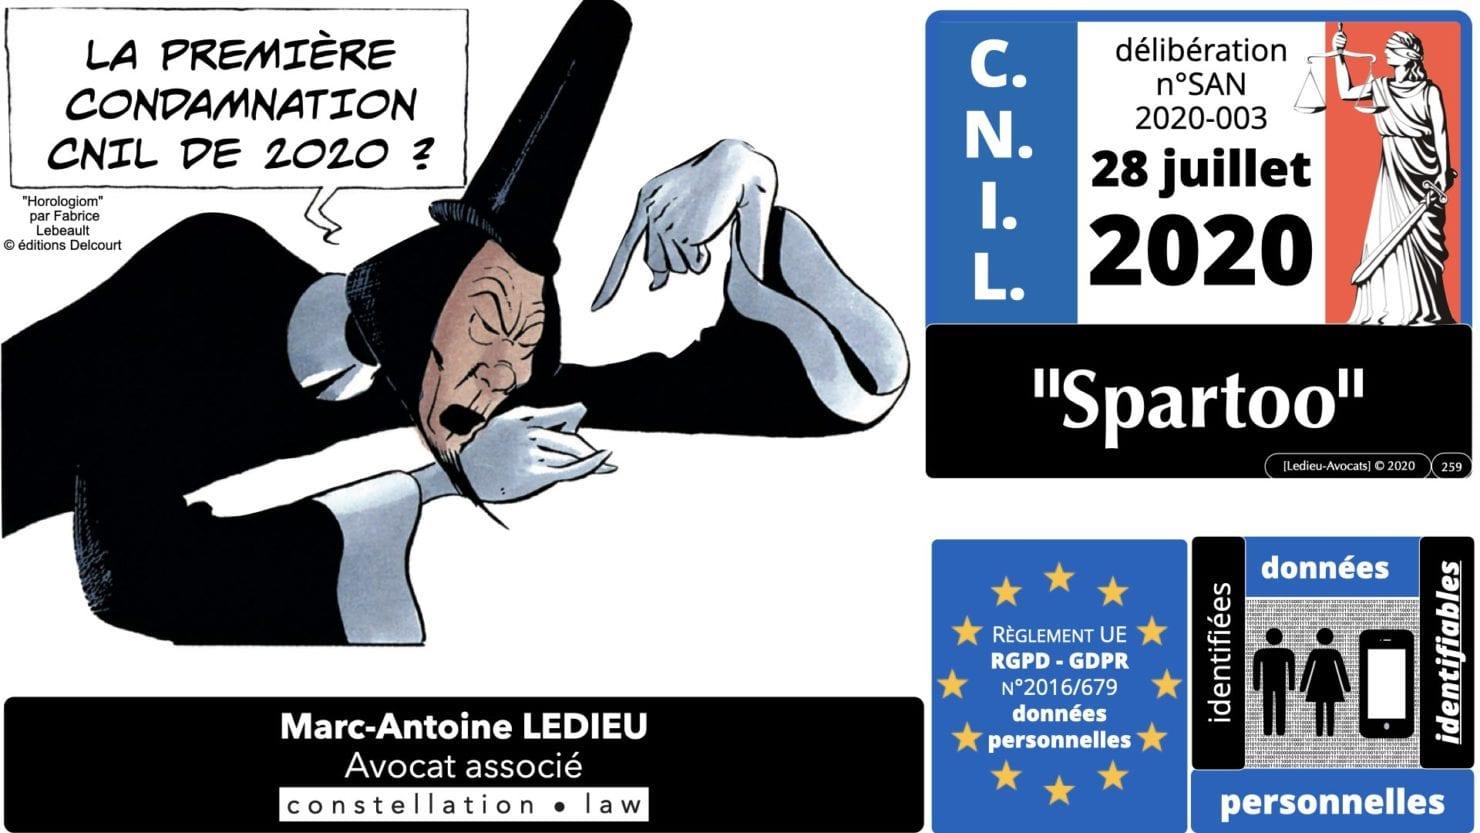 RGPD e-Privacy principes actualité jurisprudence ©Ledieu-Avocats 25-06-2021.259